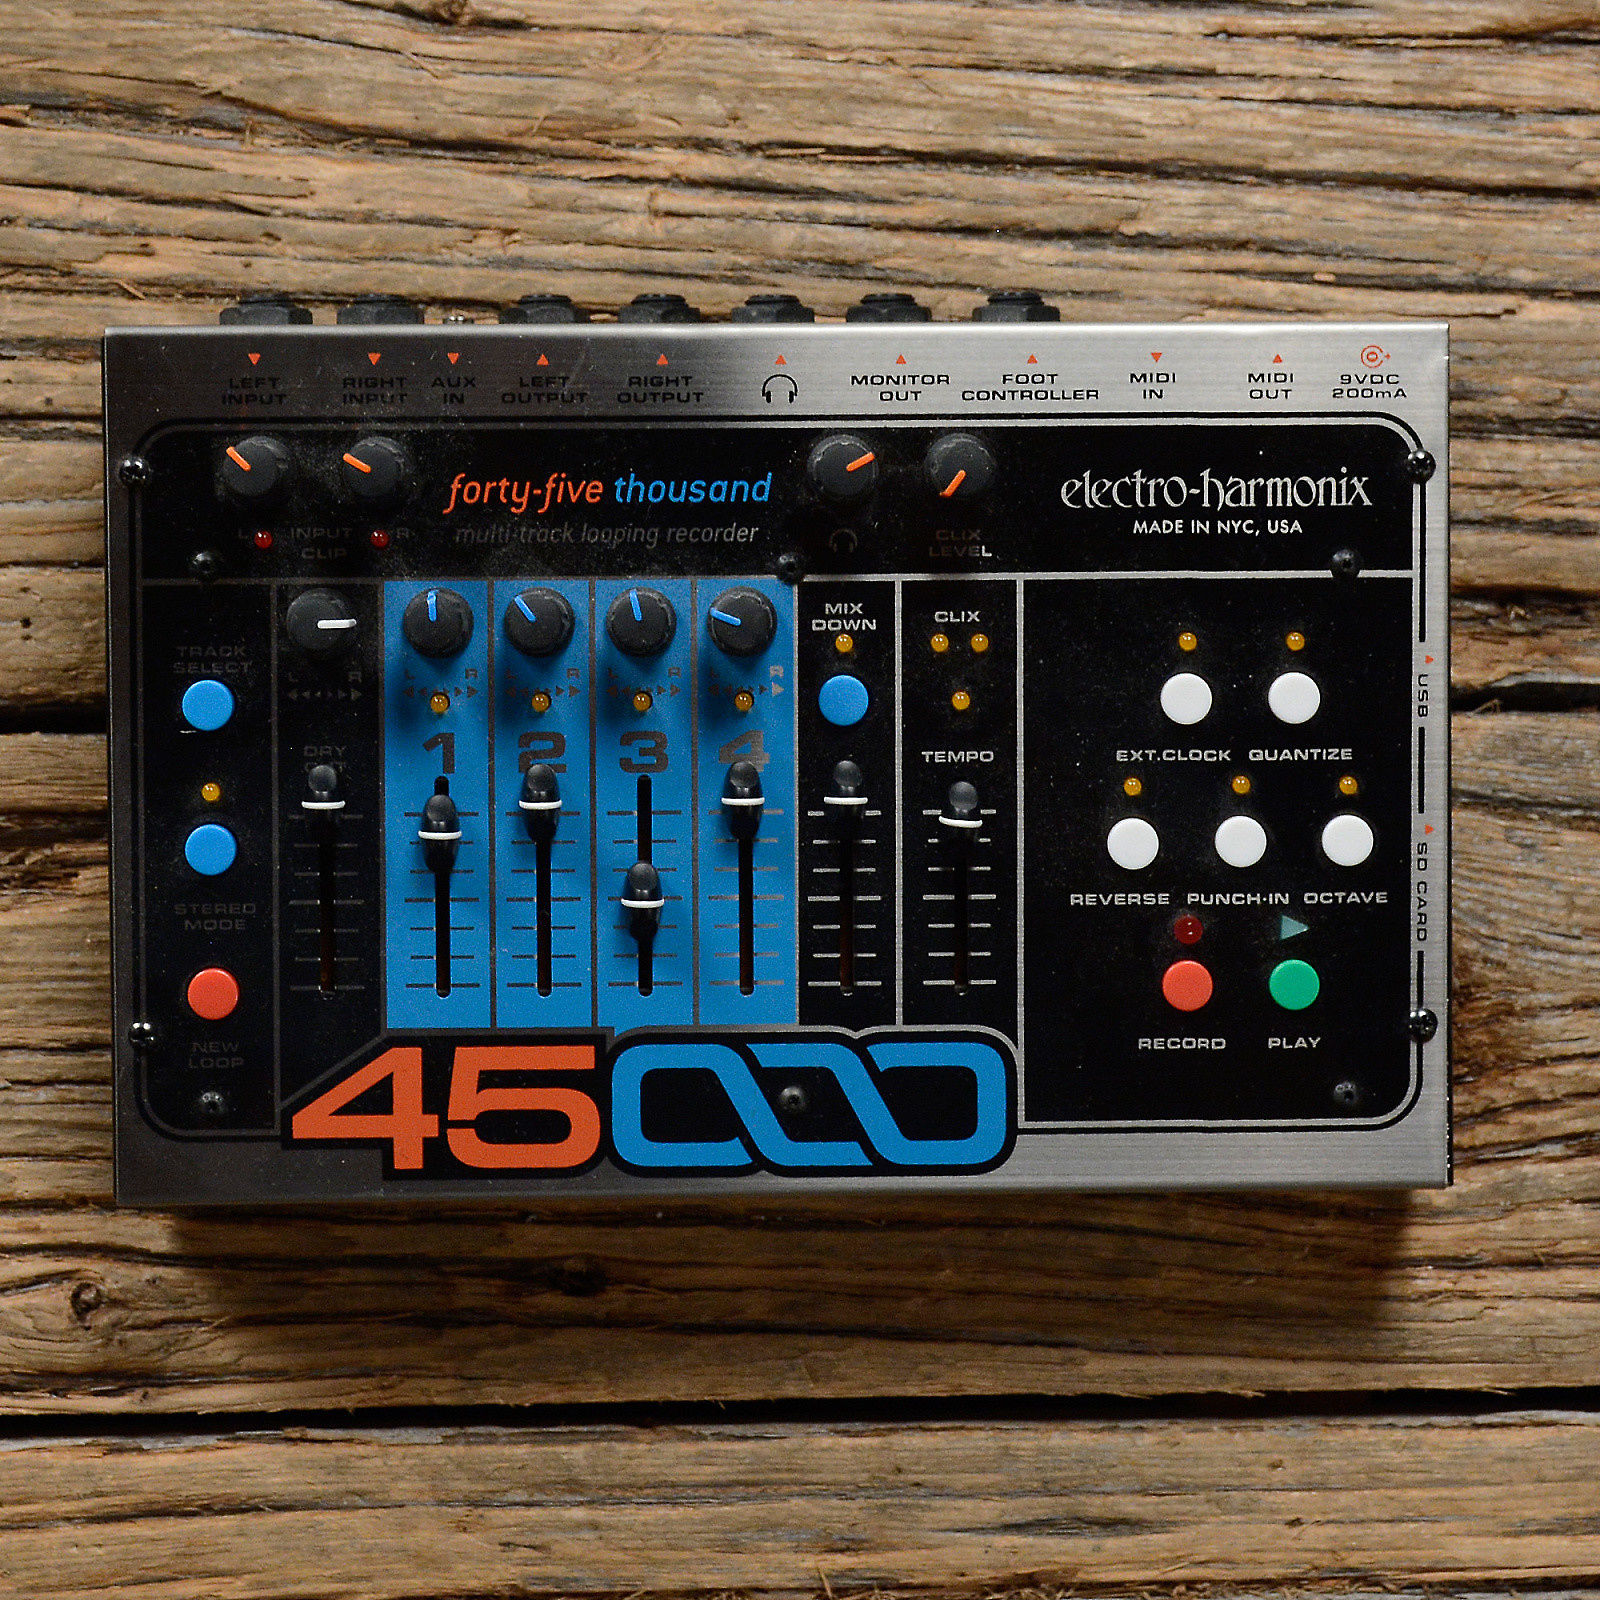 New Electro-Harmonix EHX 45000 Multi-Track Looping Recorder Pedal w//Foot Control